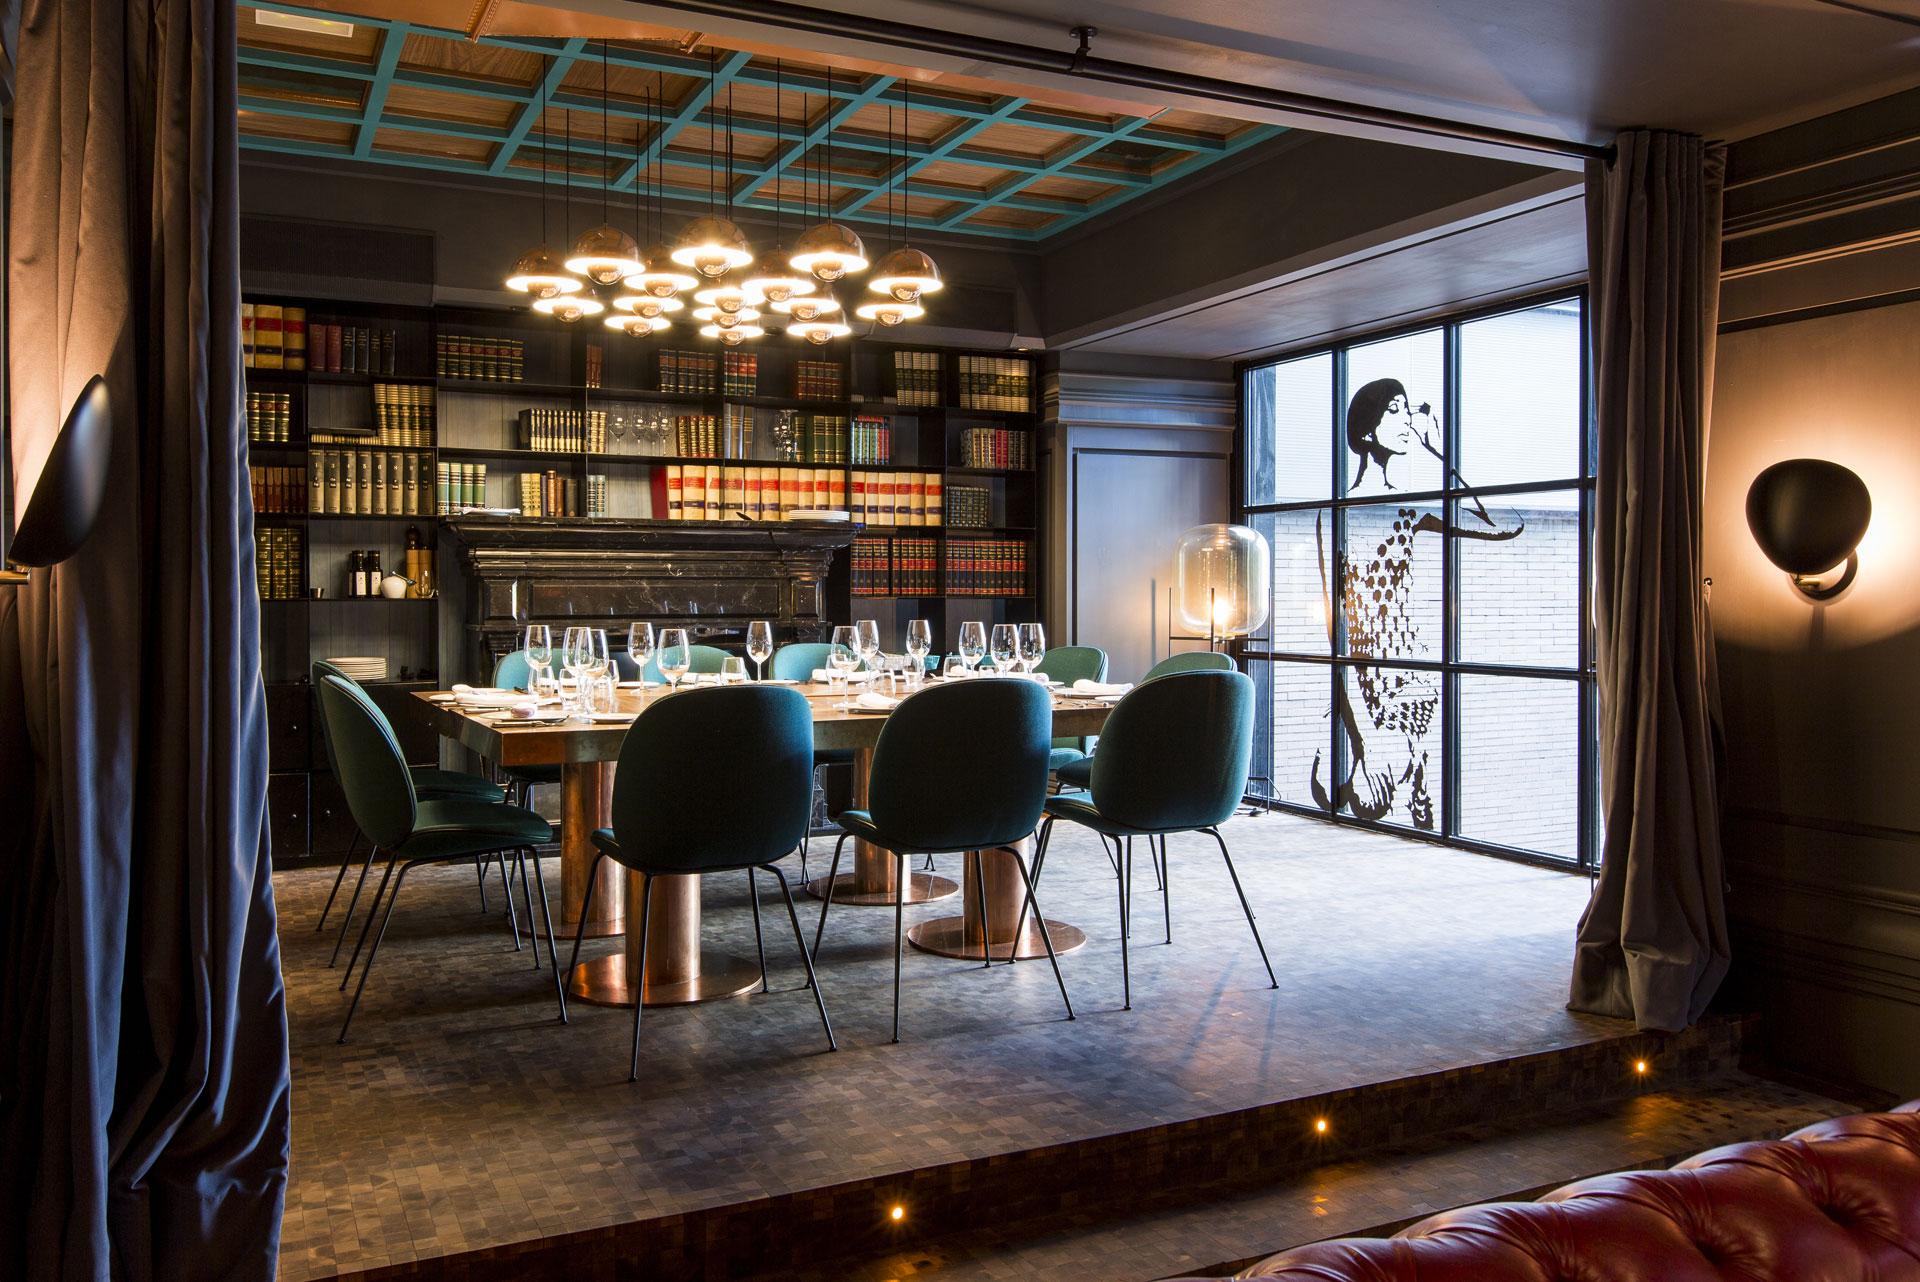 Fotos de hoteles de dise o de espa a en fotos insp rate - Hoteles de diseno espana ...